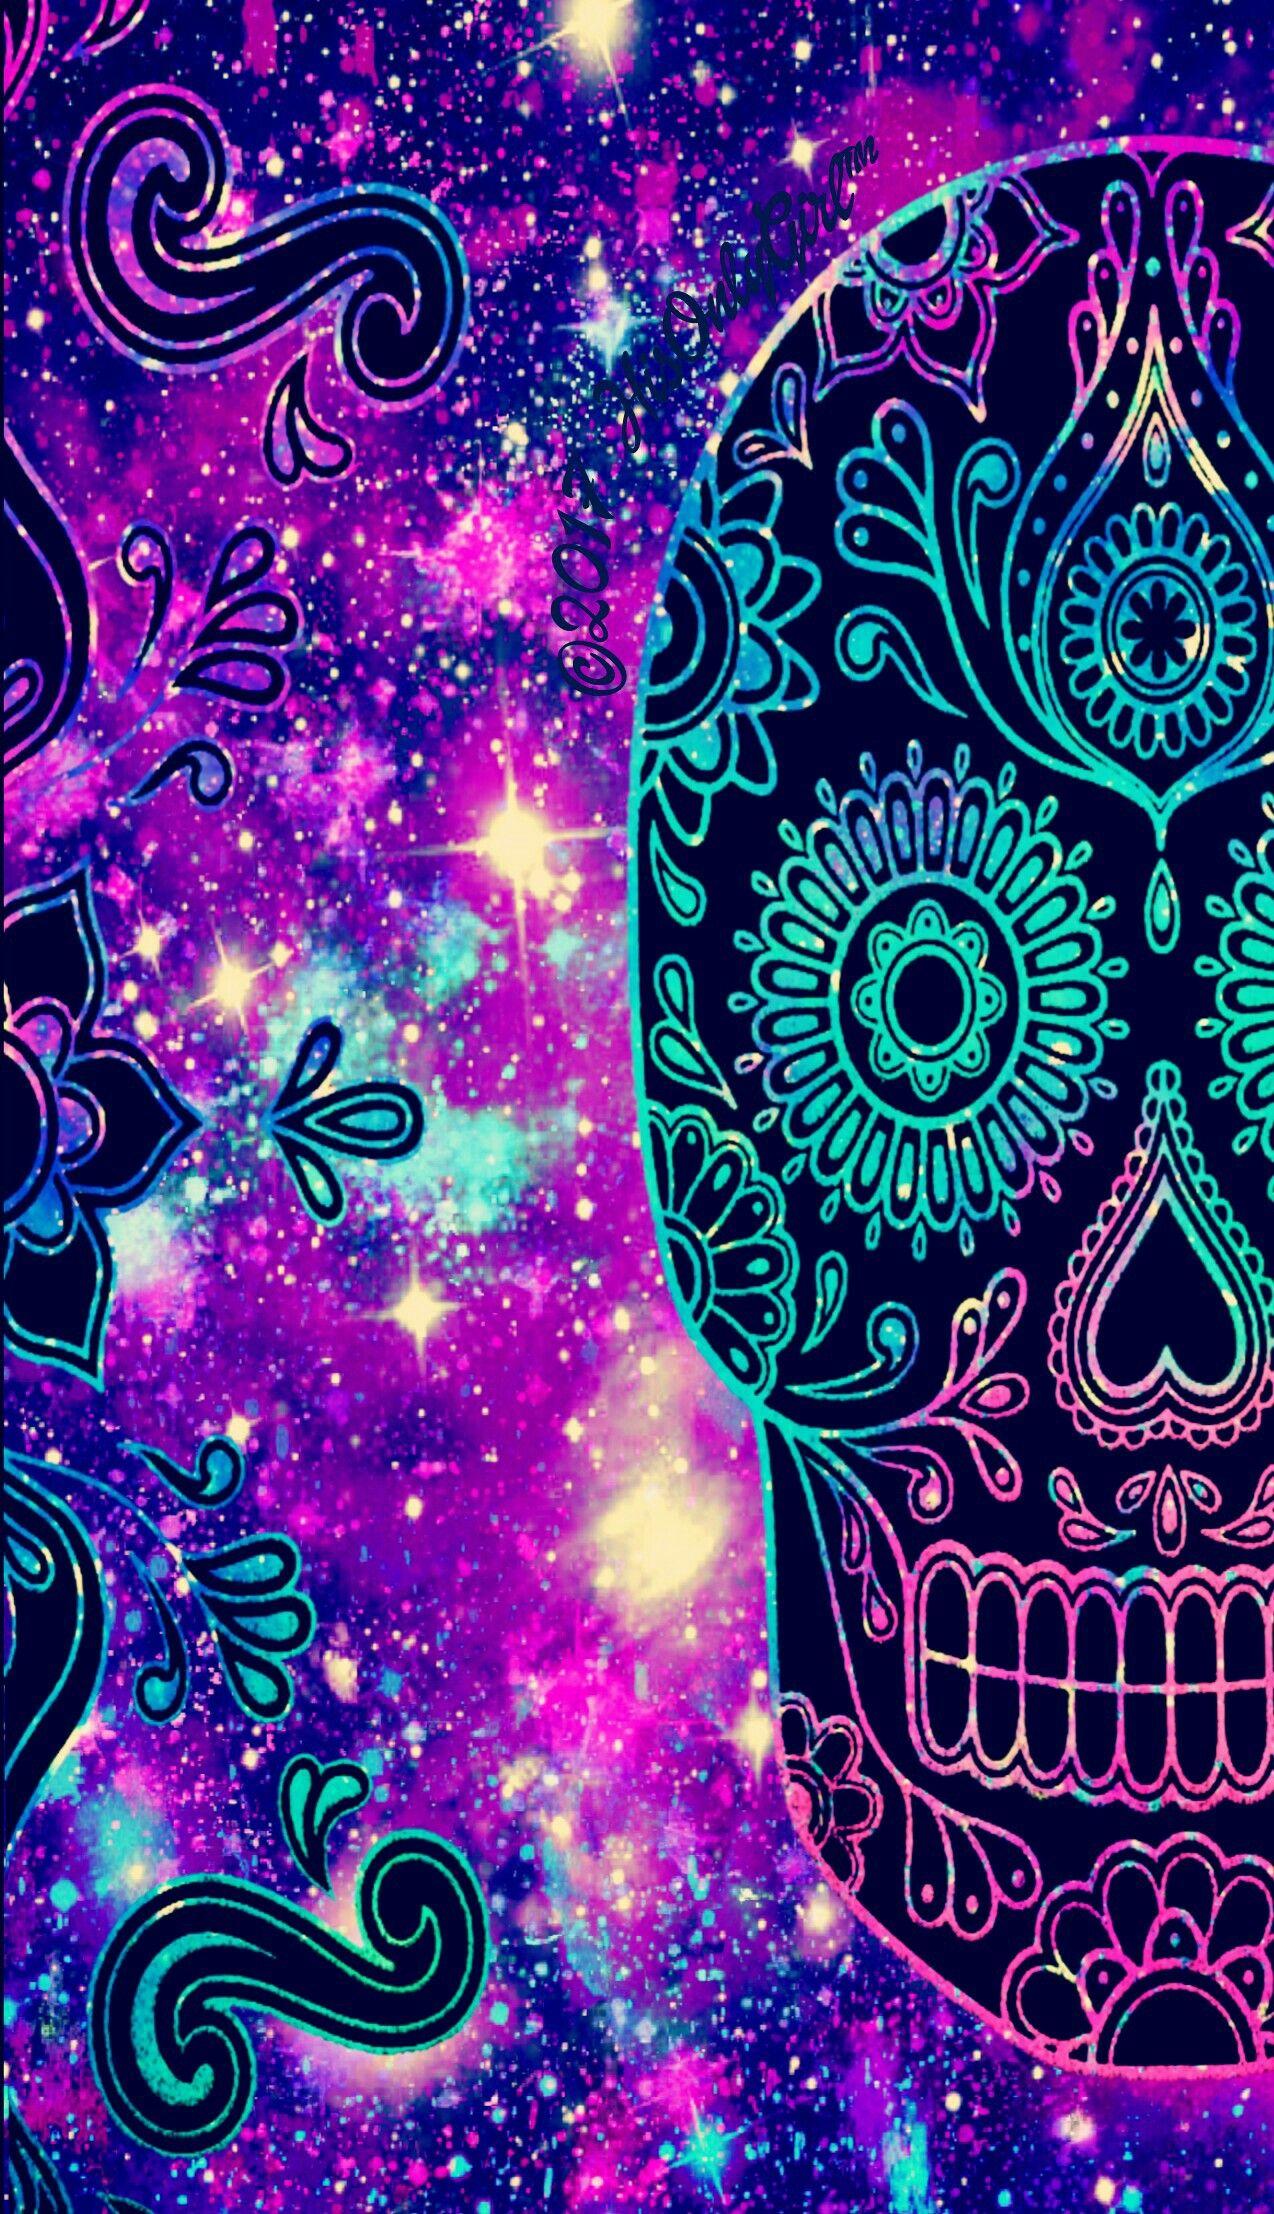 Colorful Tribal Galaxy Skull Wallpaper I Created For The App Cocoppa Skull Wallpaper Art Wallpaper Iphone Cute Galaxy Wallpaper